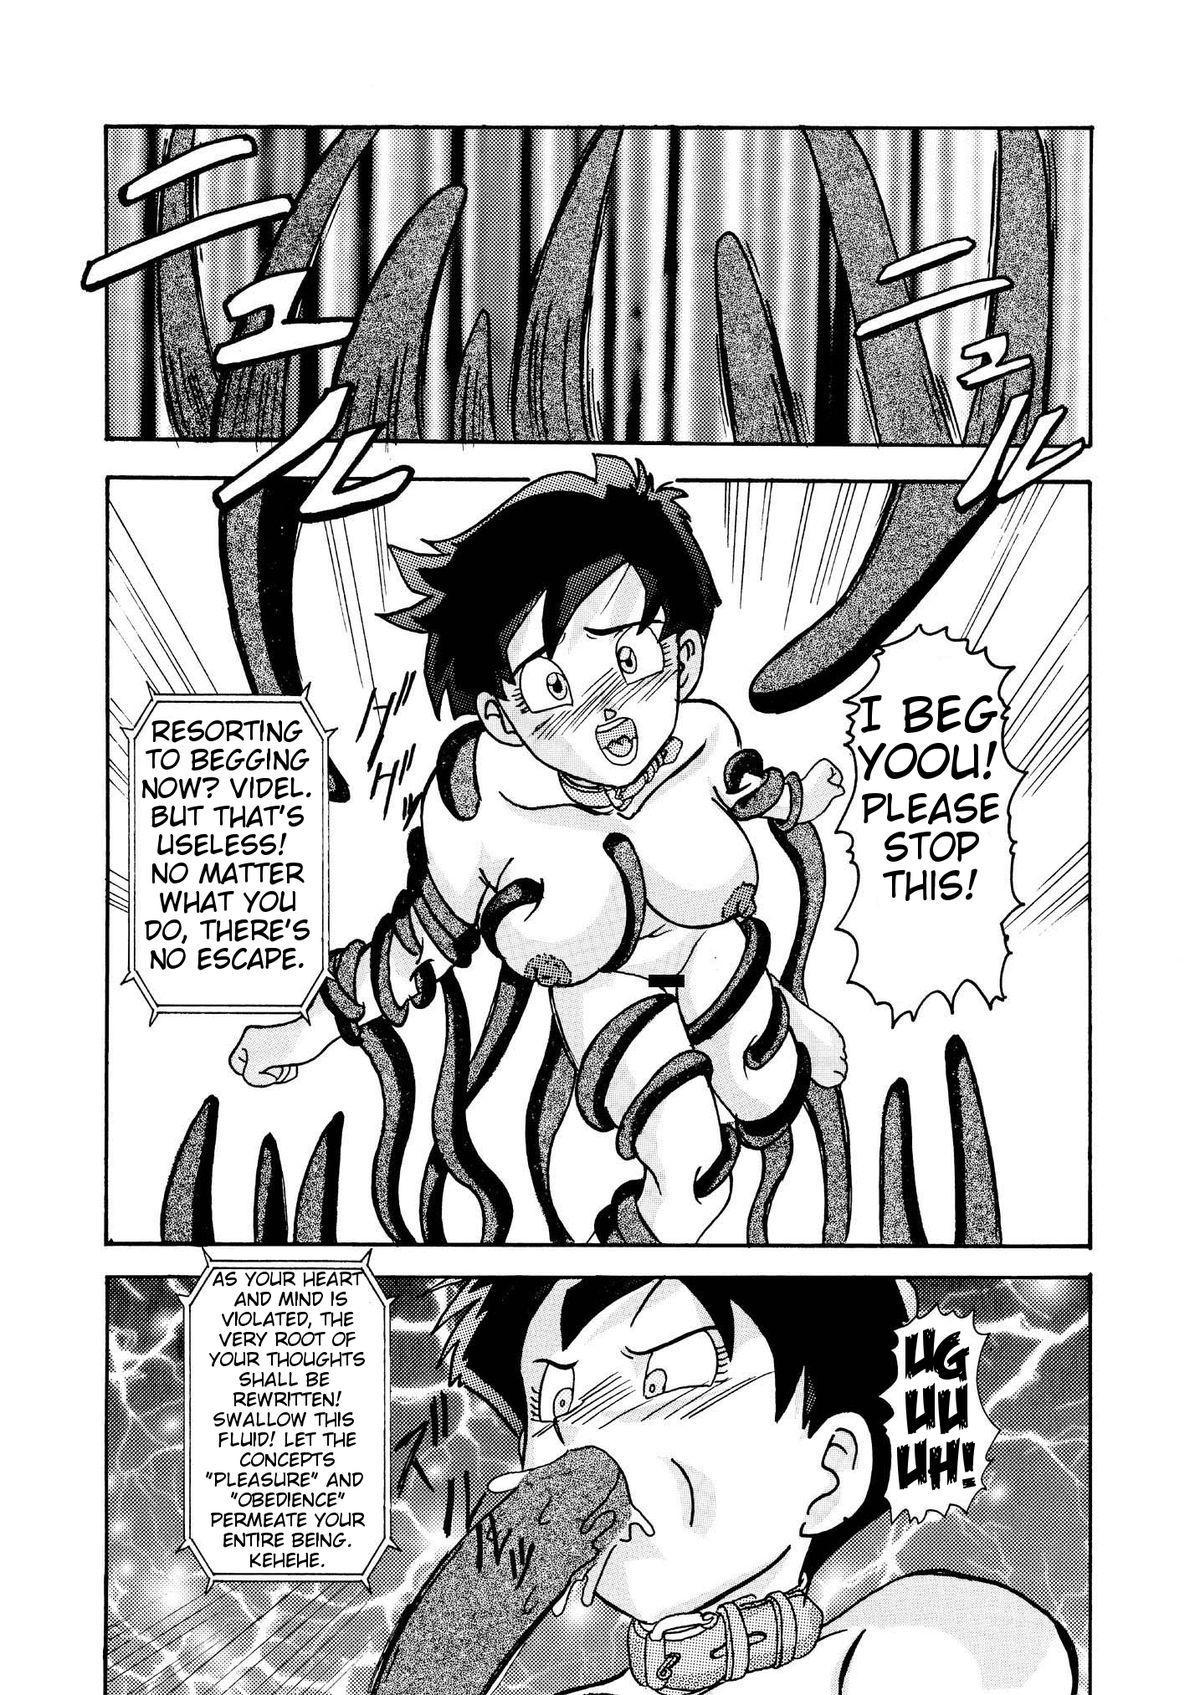 [Light Rate Port Pink] Tanjou!! Aku no Onna Senshi - Videl Sennou Kaizou Keikaku | Birth of an evil female soldier - The Videl brainwashing project  (Dragon Ball Z) [English] [DarkSpooky] 16